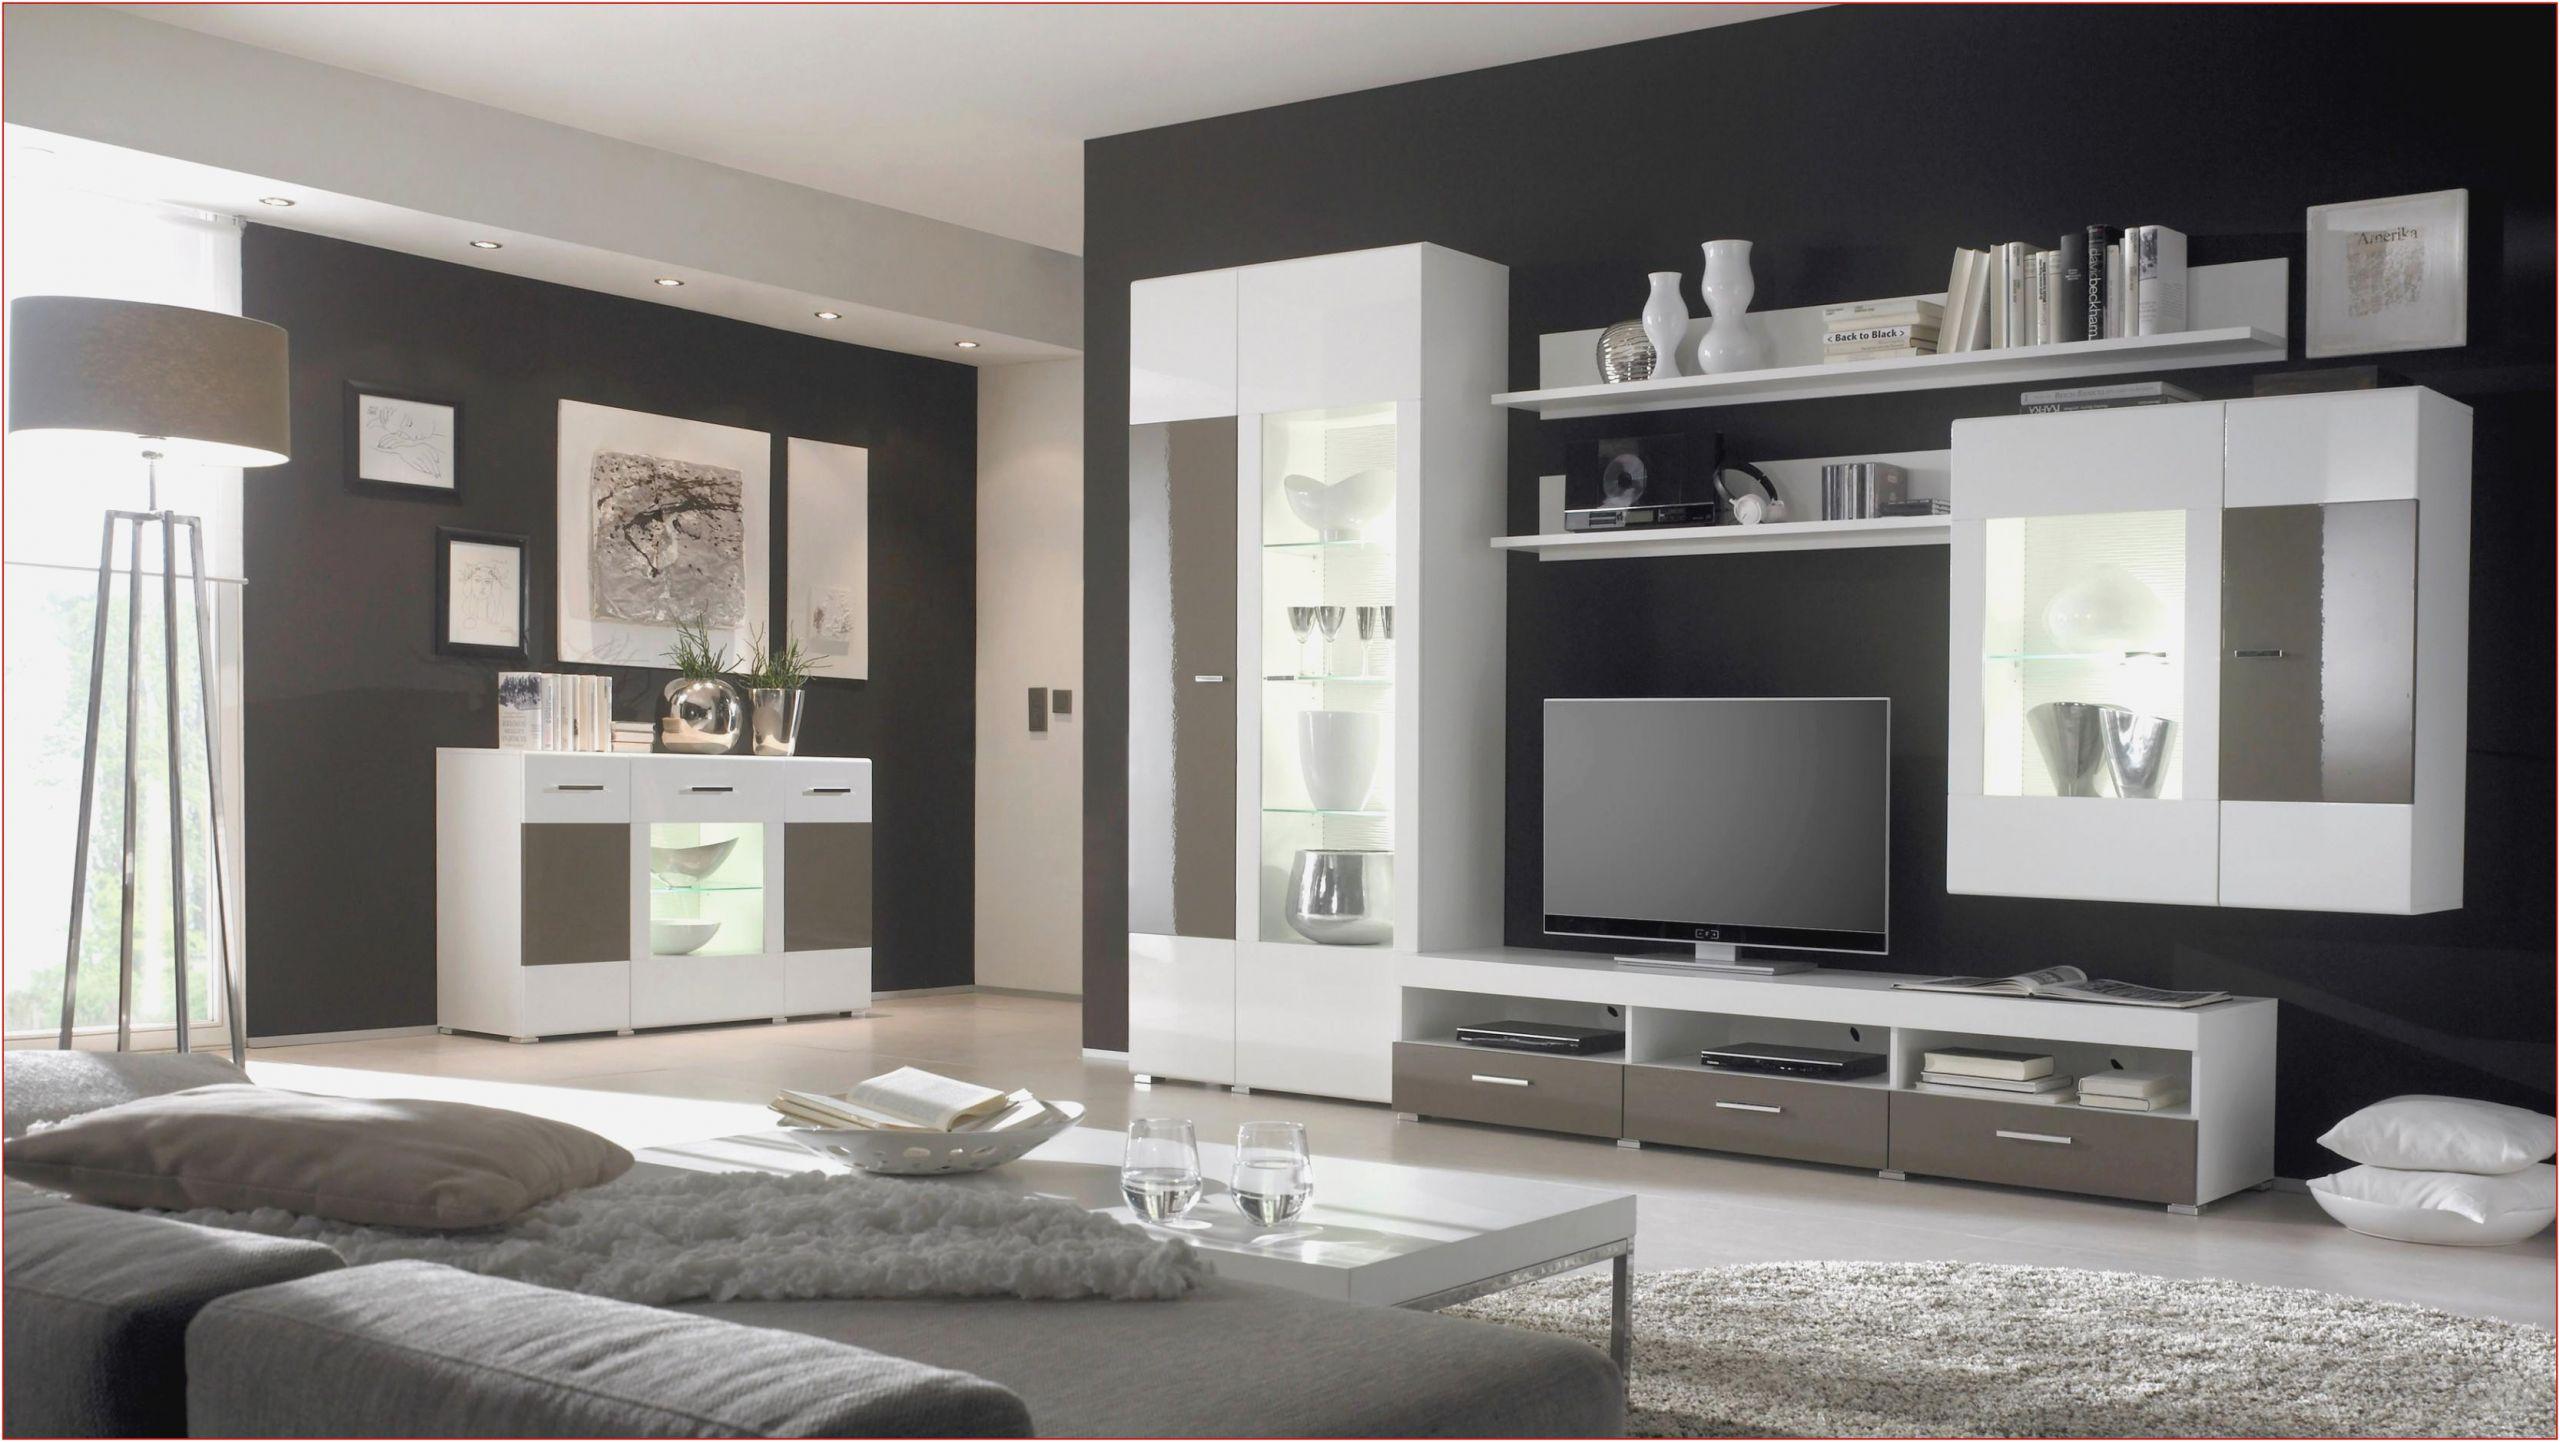 Badezimmer Ideen Türkis Badezimmer Seifenspender Set Türkis Ankleidezimmer